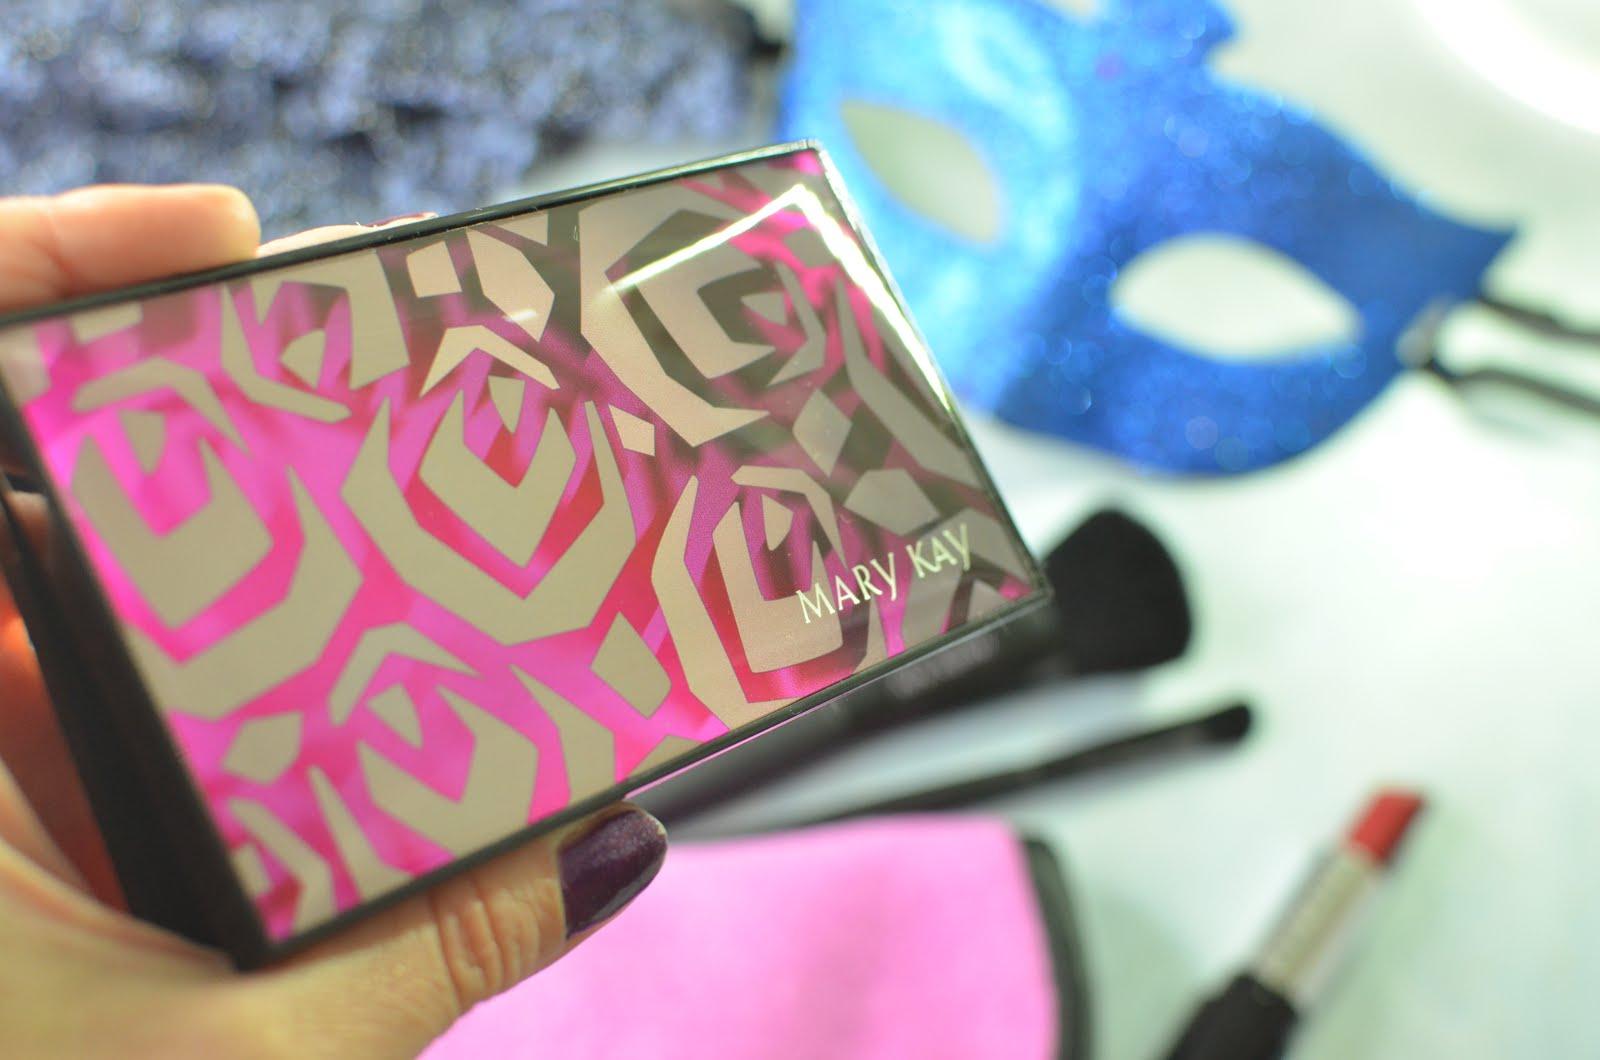 MARY KAY Perfect Palette, тени ChromaFusion, румяна, кисти и макияж